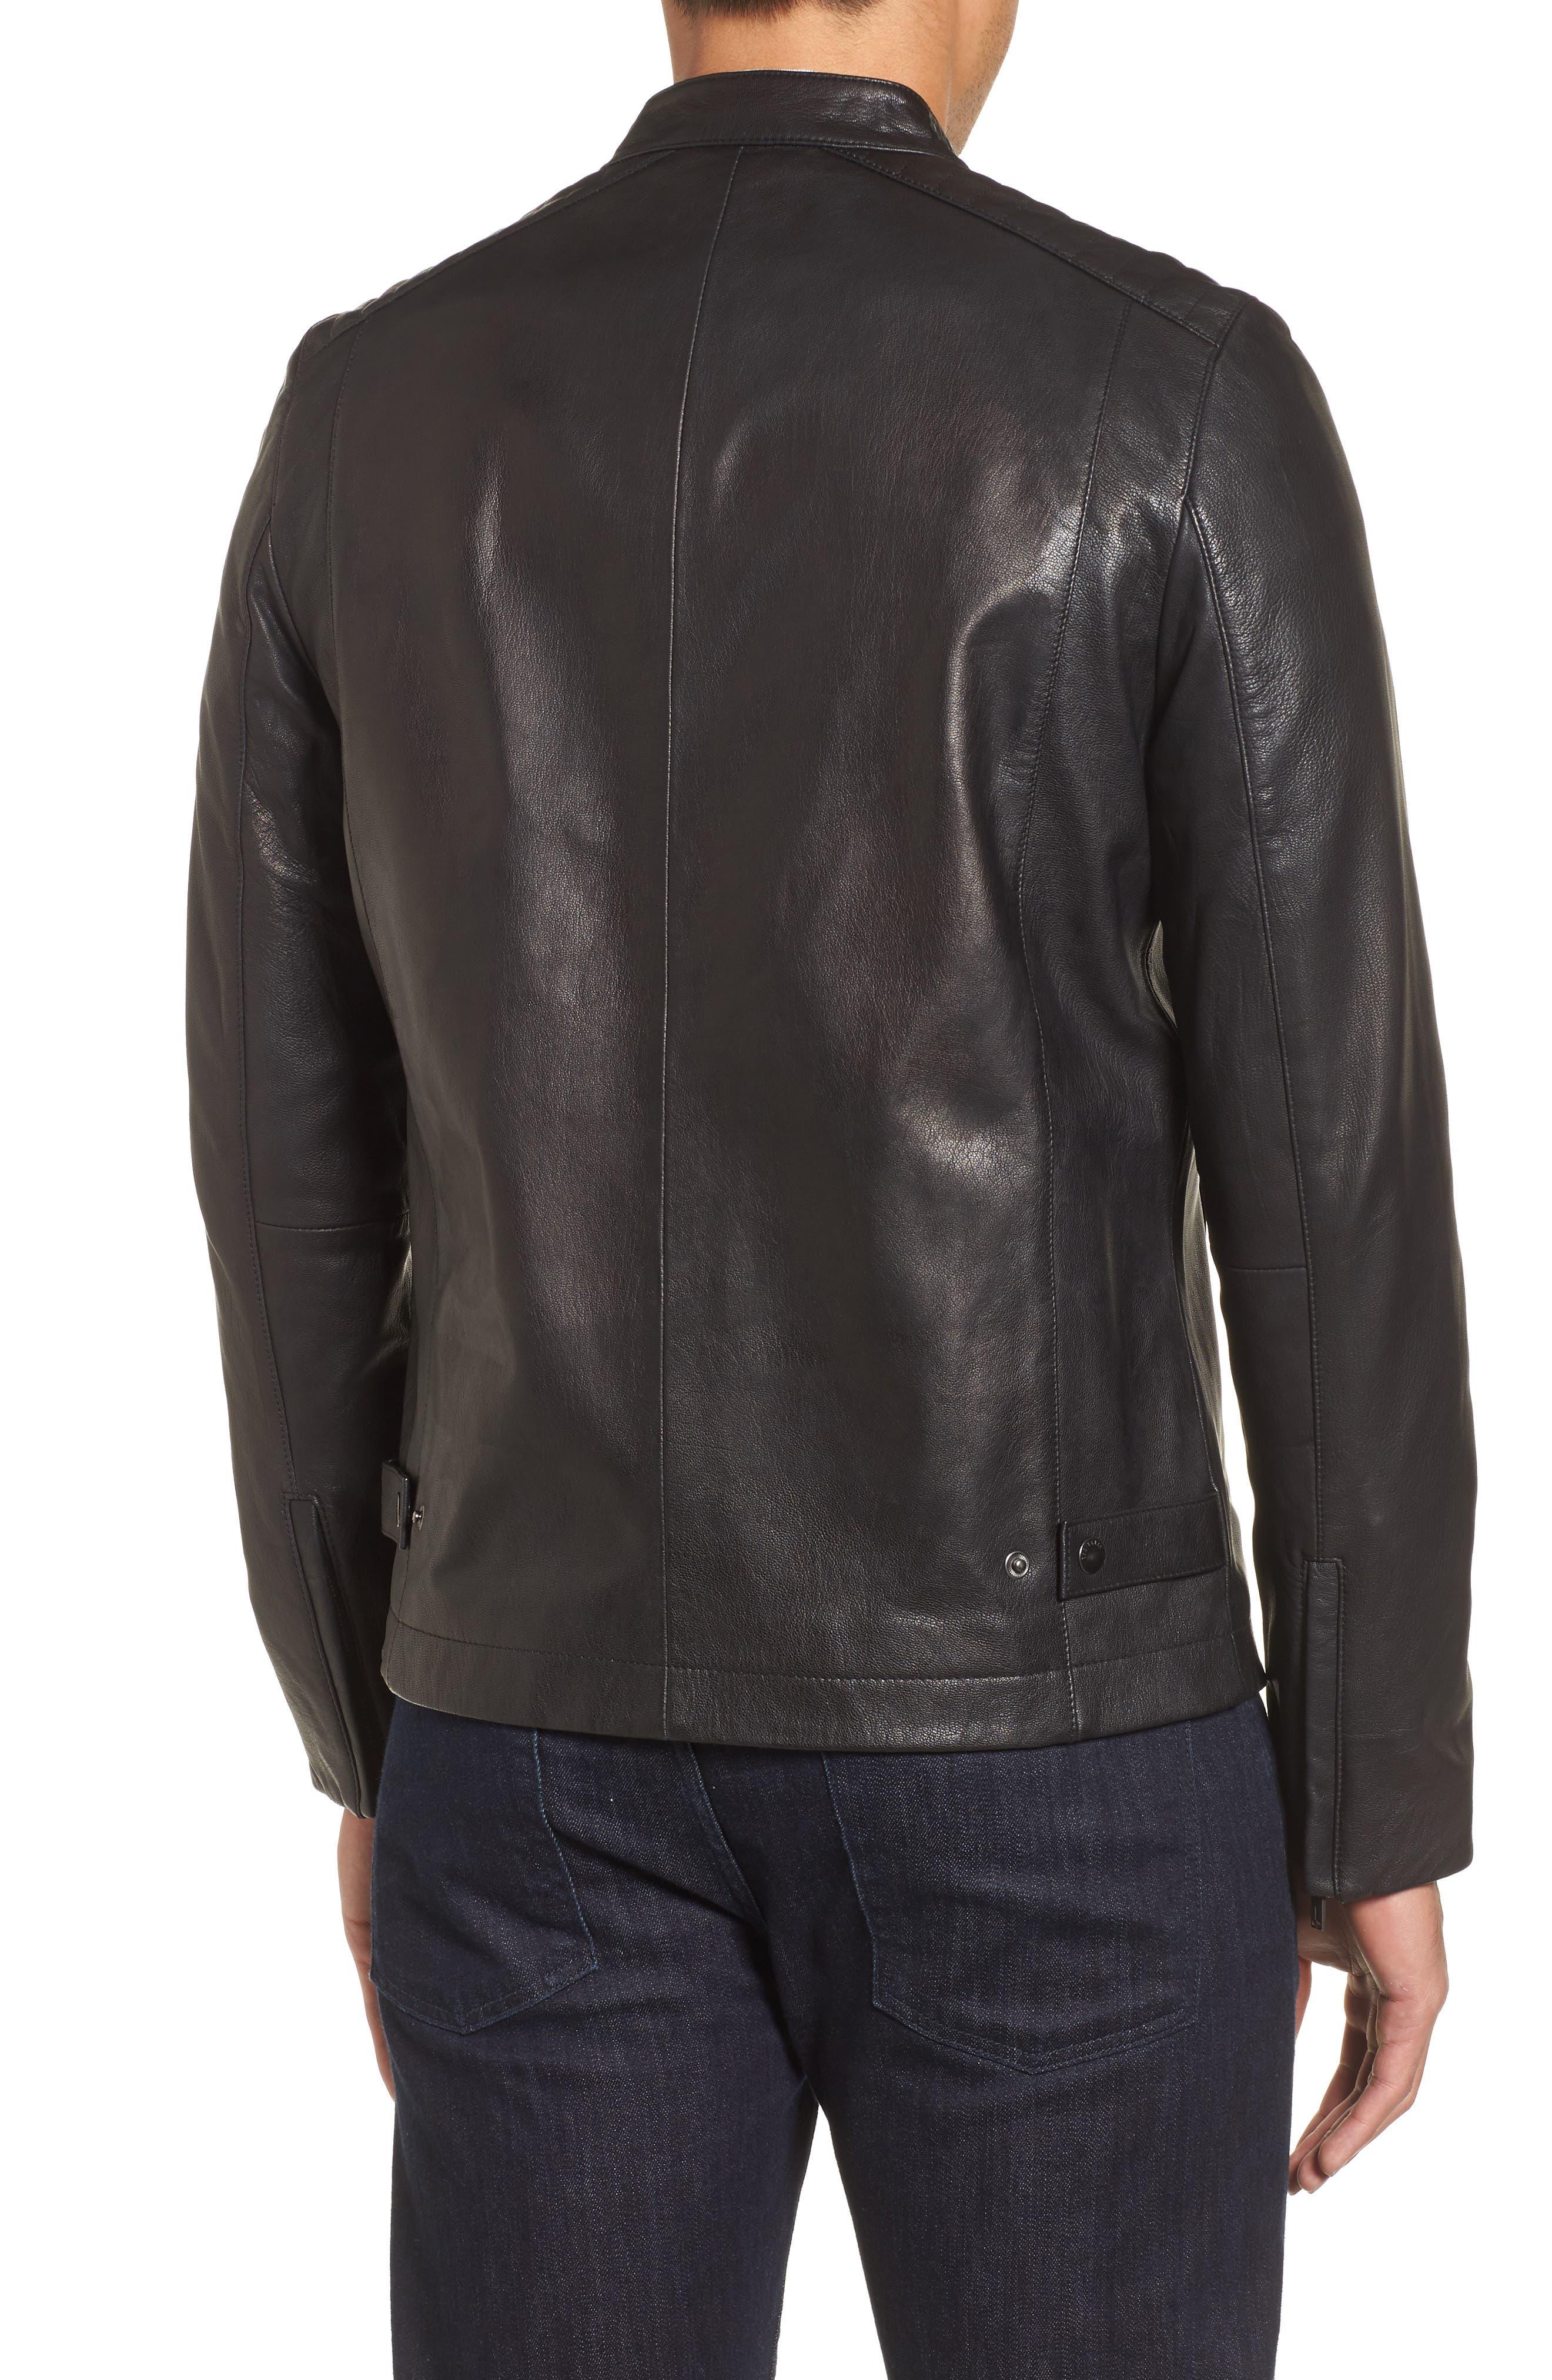 Mate Leather Biker Jacket,                             Alternate thumbnail 2, color,                             001